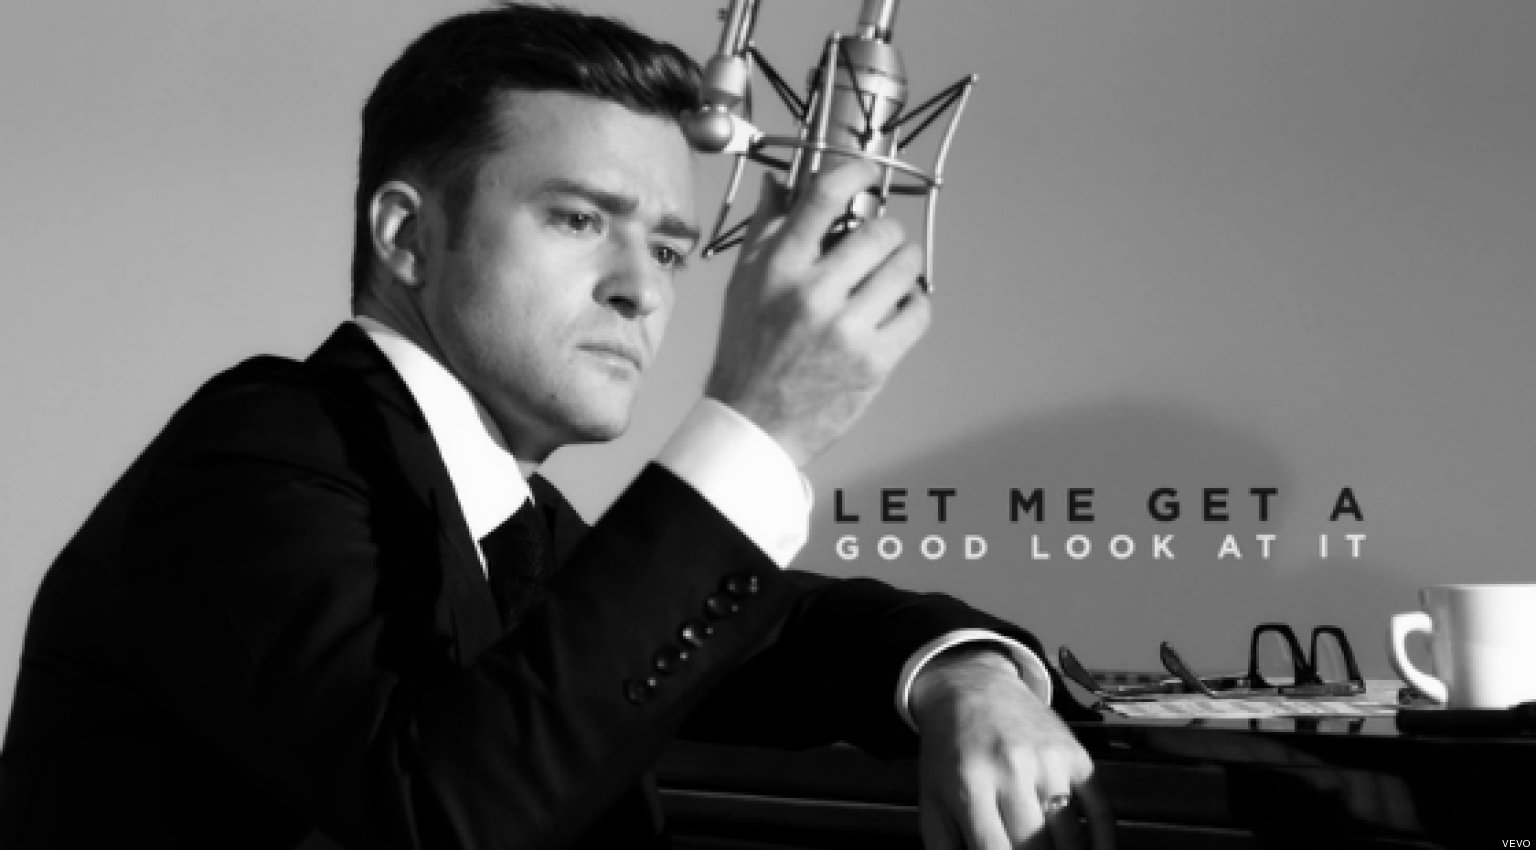 Businessman Quotes Wallpaper Suit Amp Tie Lyric Video Justin Timberlake Gets Dressed